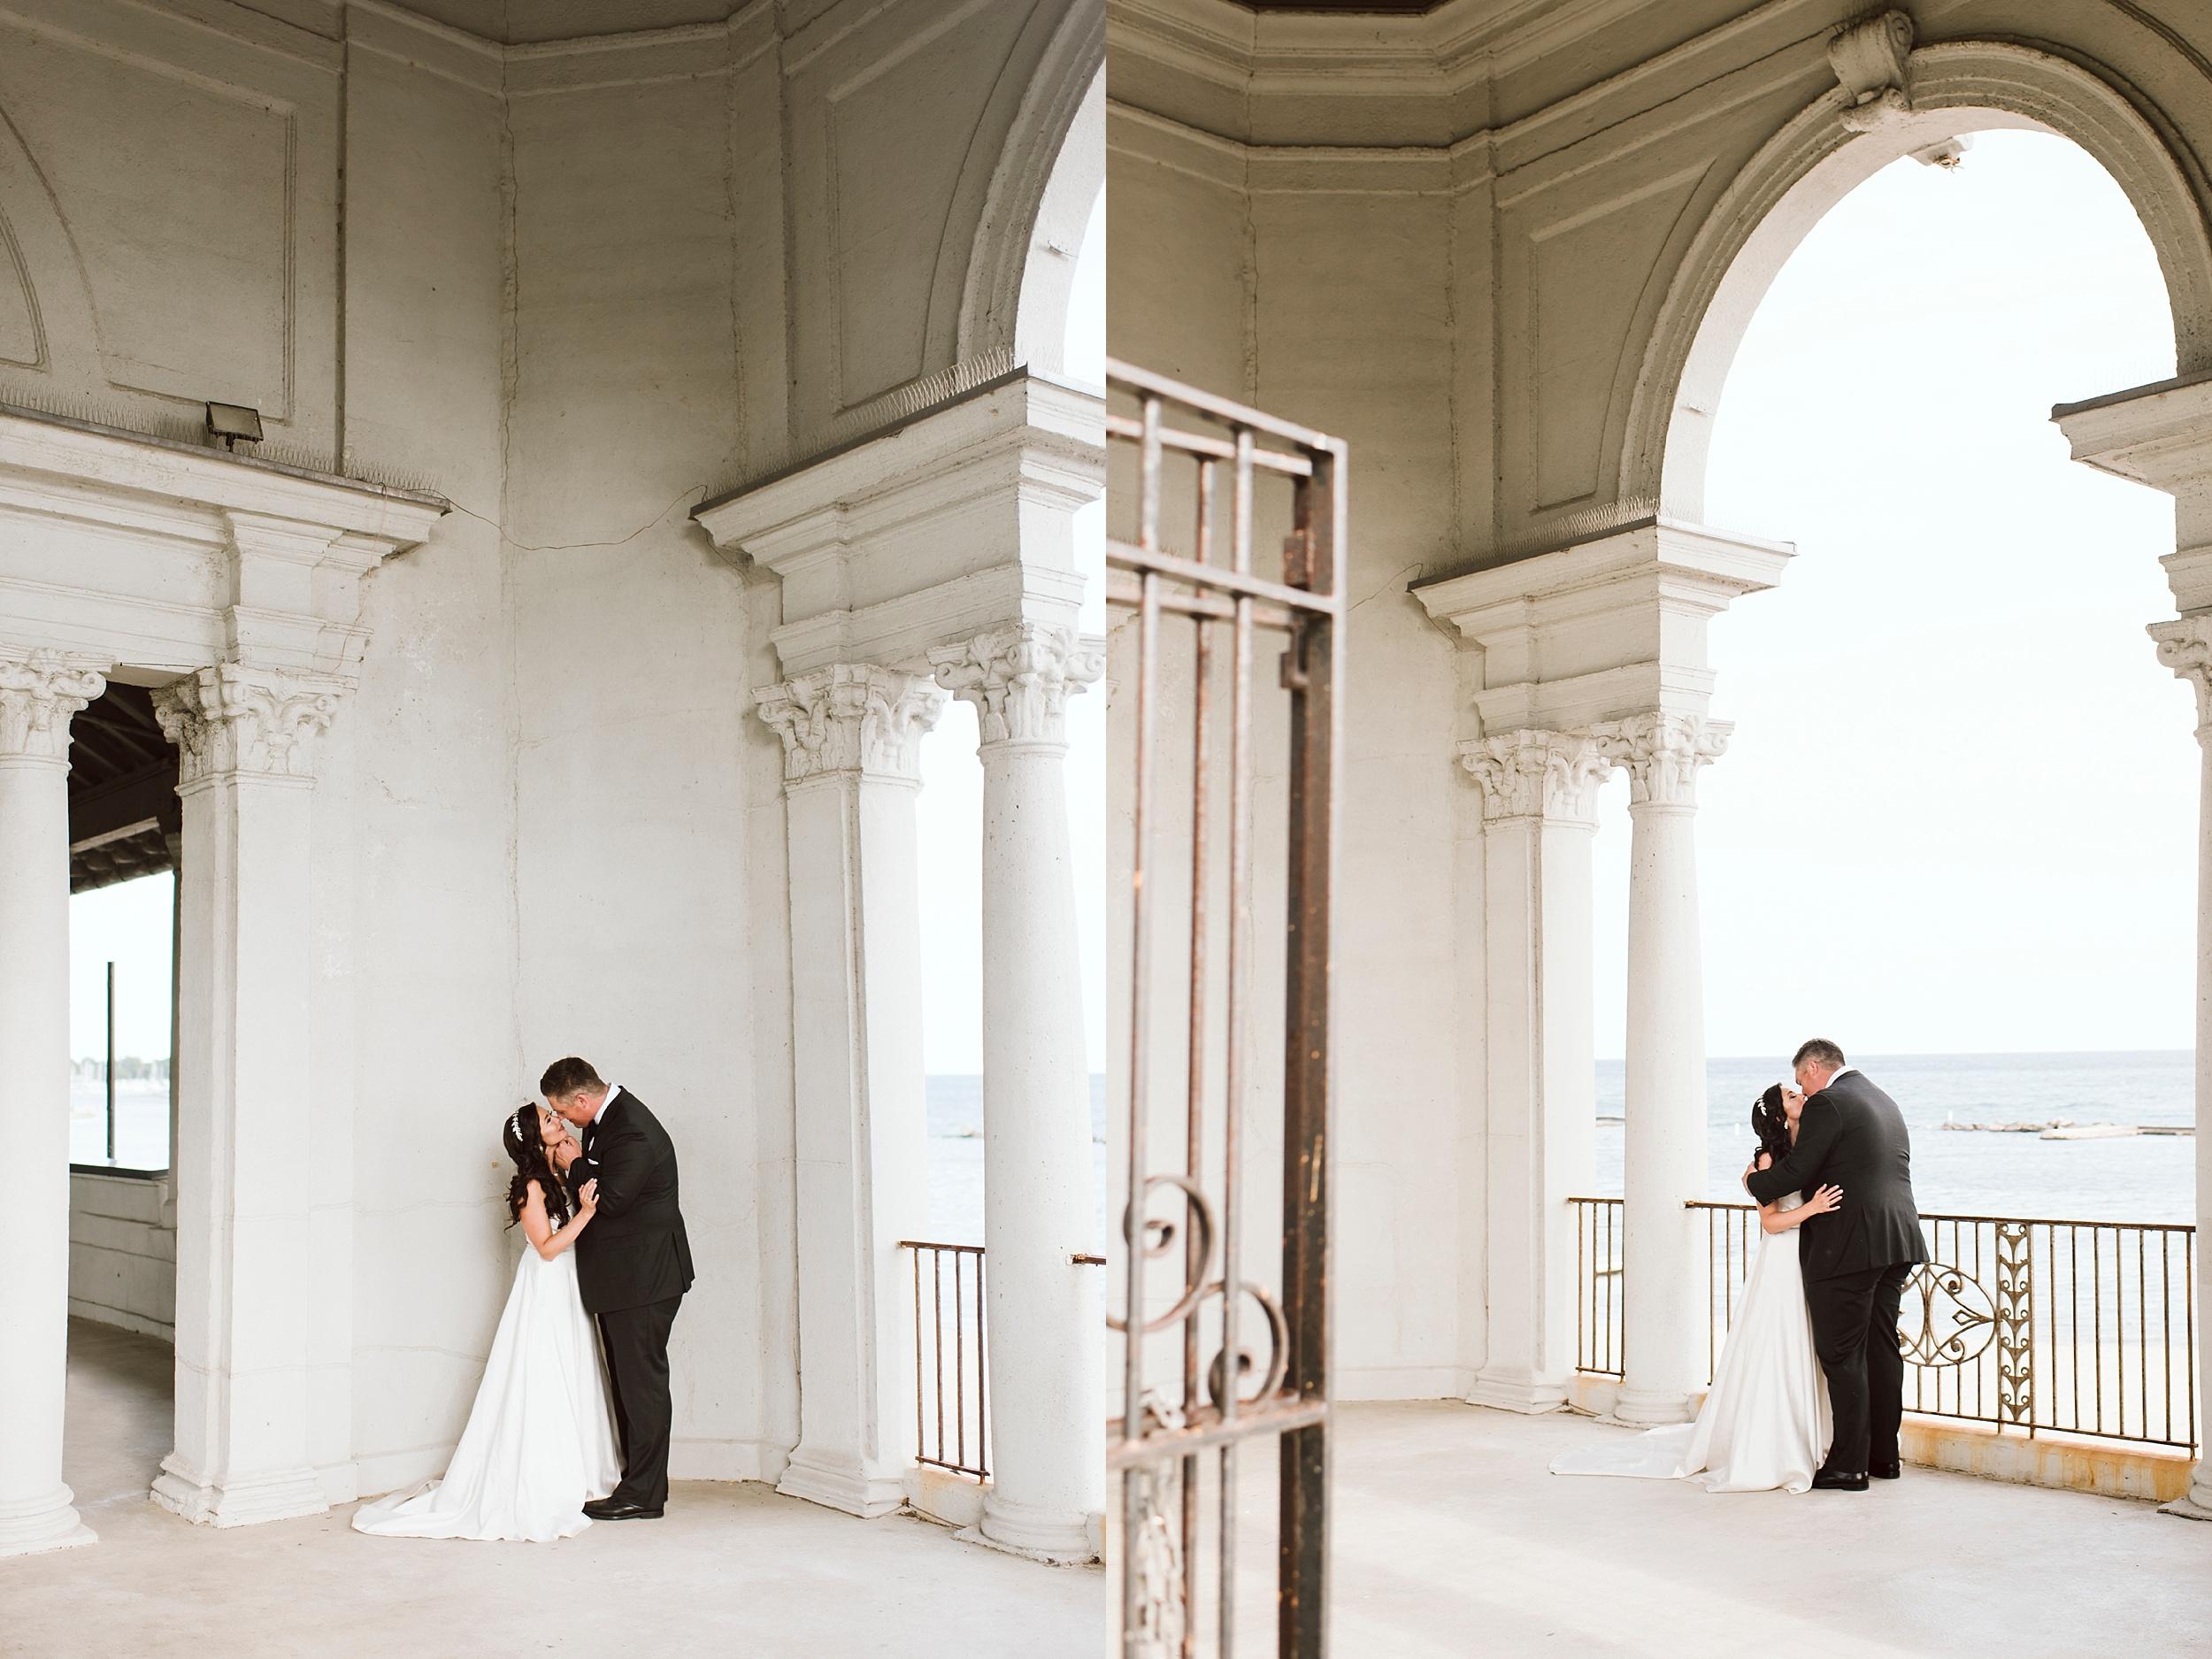 Sunnyside_Pavilion_Wedding_Toronto_Photographer_0058.jpg